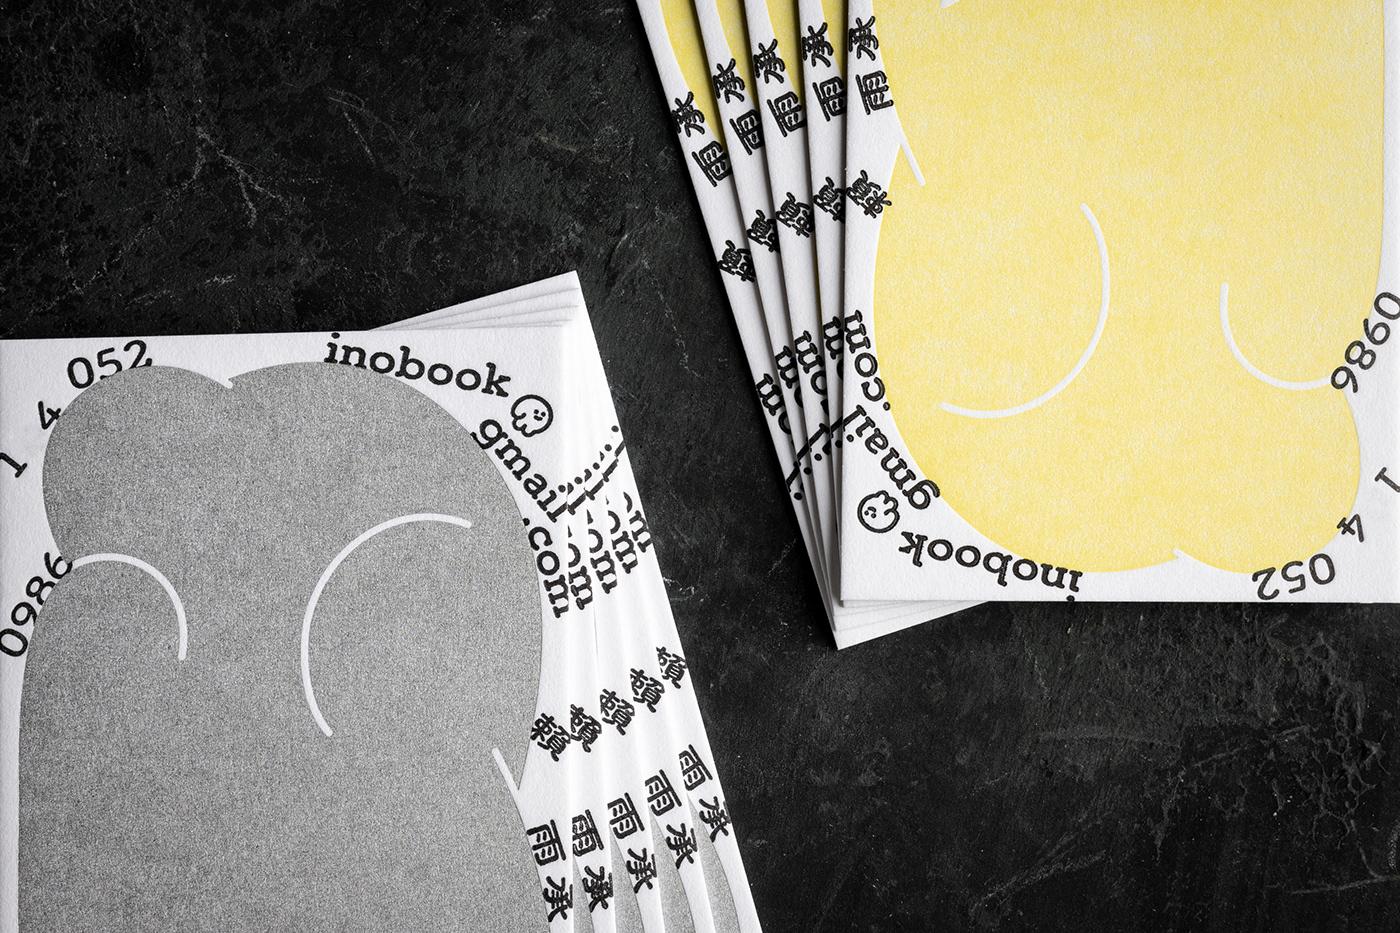 #sionhsu #inolai #ball #yellow #2020 #design #graphic #motion #ci #vi #illustrator #Taiwan #nantou #coutun #cute #AE #AI #renew